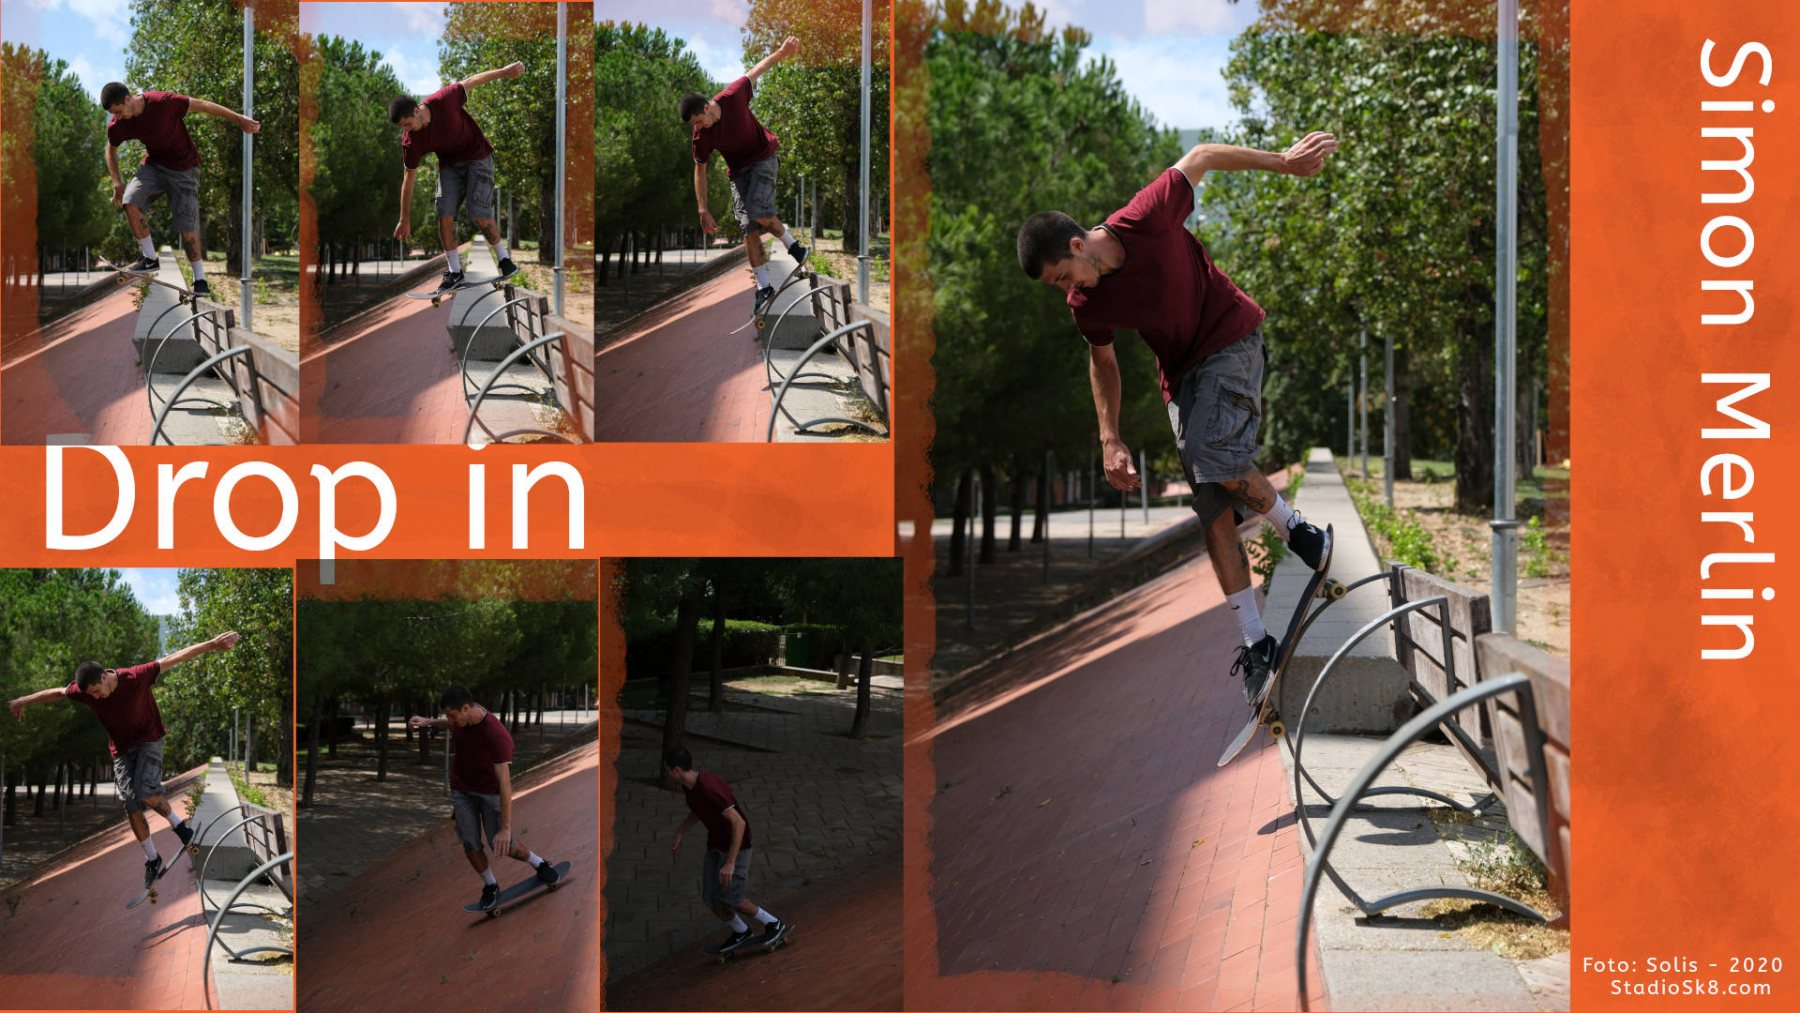 Simon-Merlin-drop-in-agosto-2020